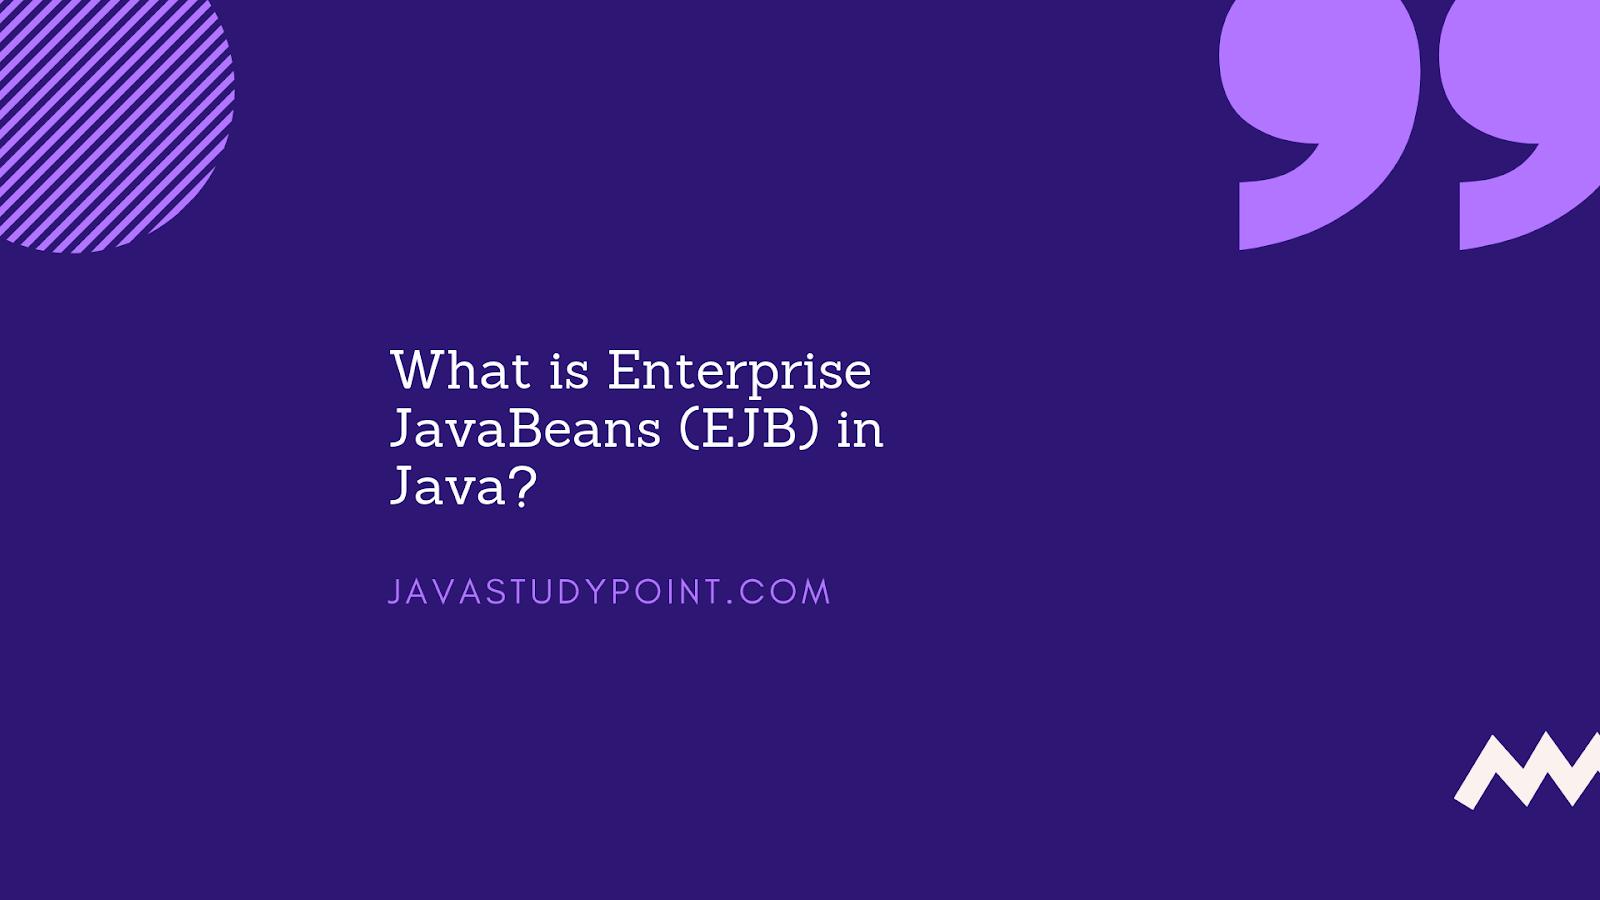 What is Enterprise JavaBeans (EJB)? - Javastudypoint